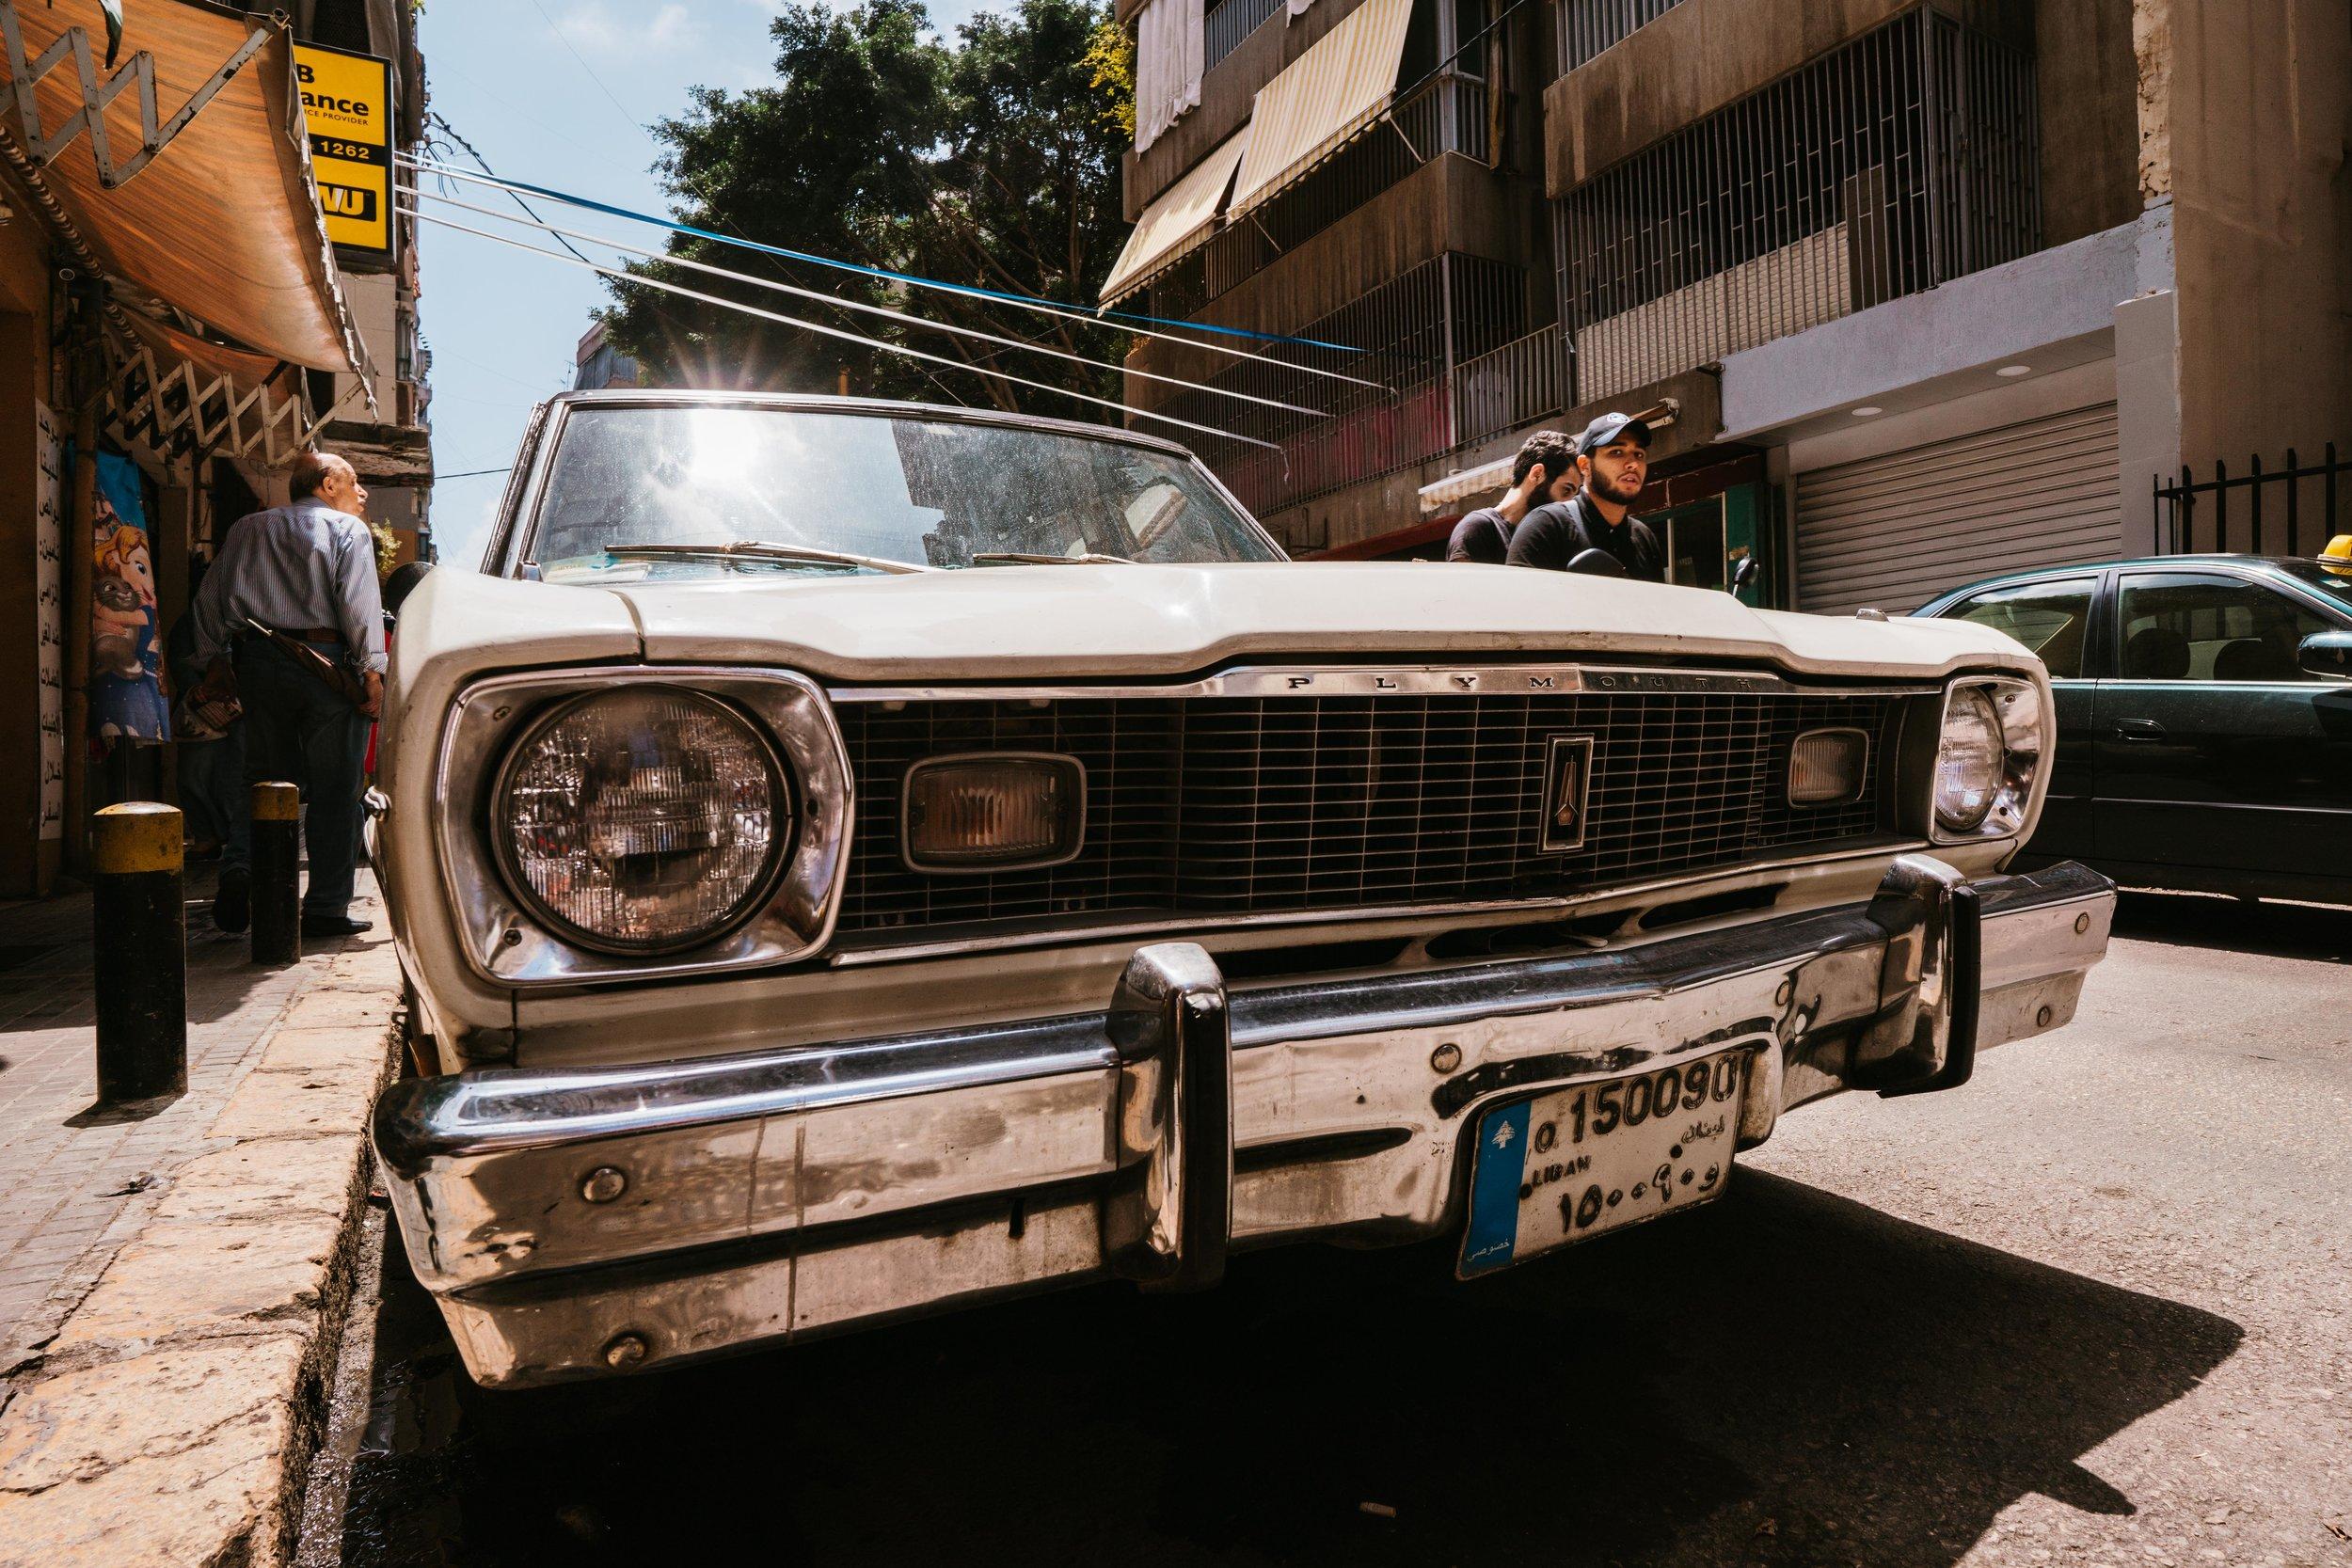 Lebanon visit-17.jpg